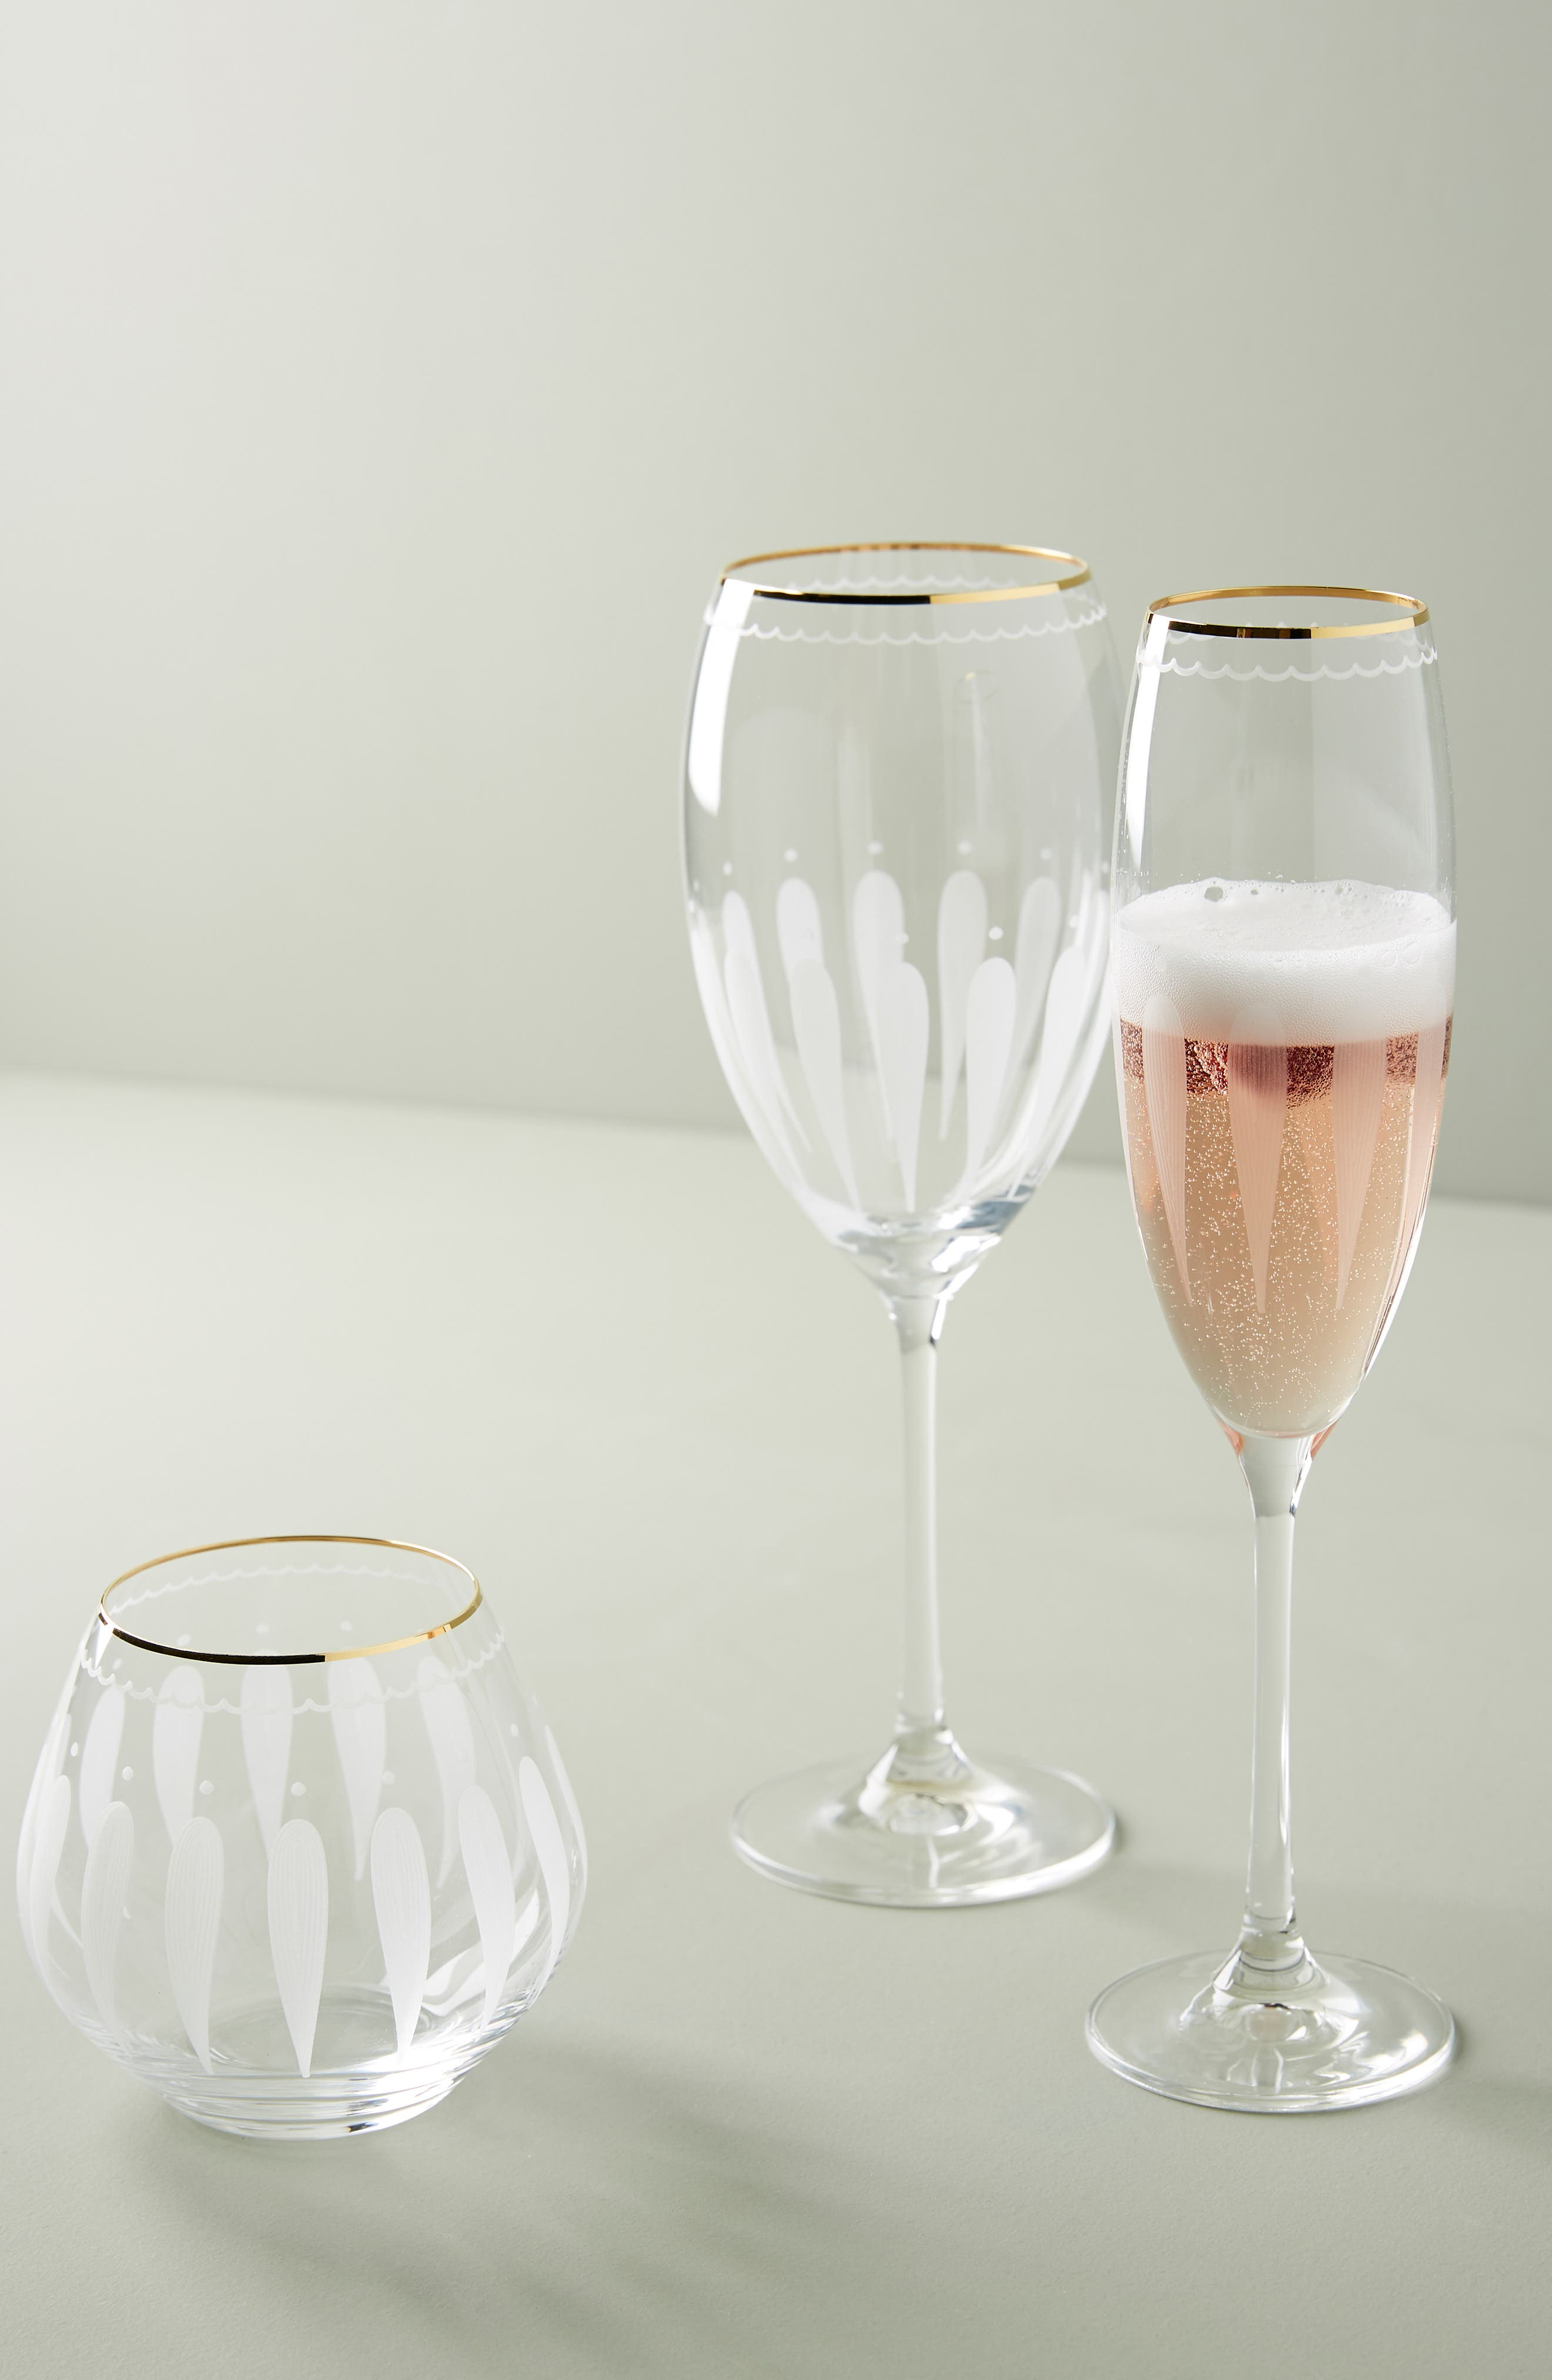 Odele Set of 4 Stemless Wine Glasses,                             Alternate thumbnail 3, color,                             CLEAR